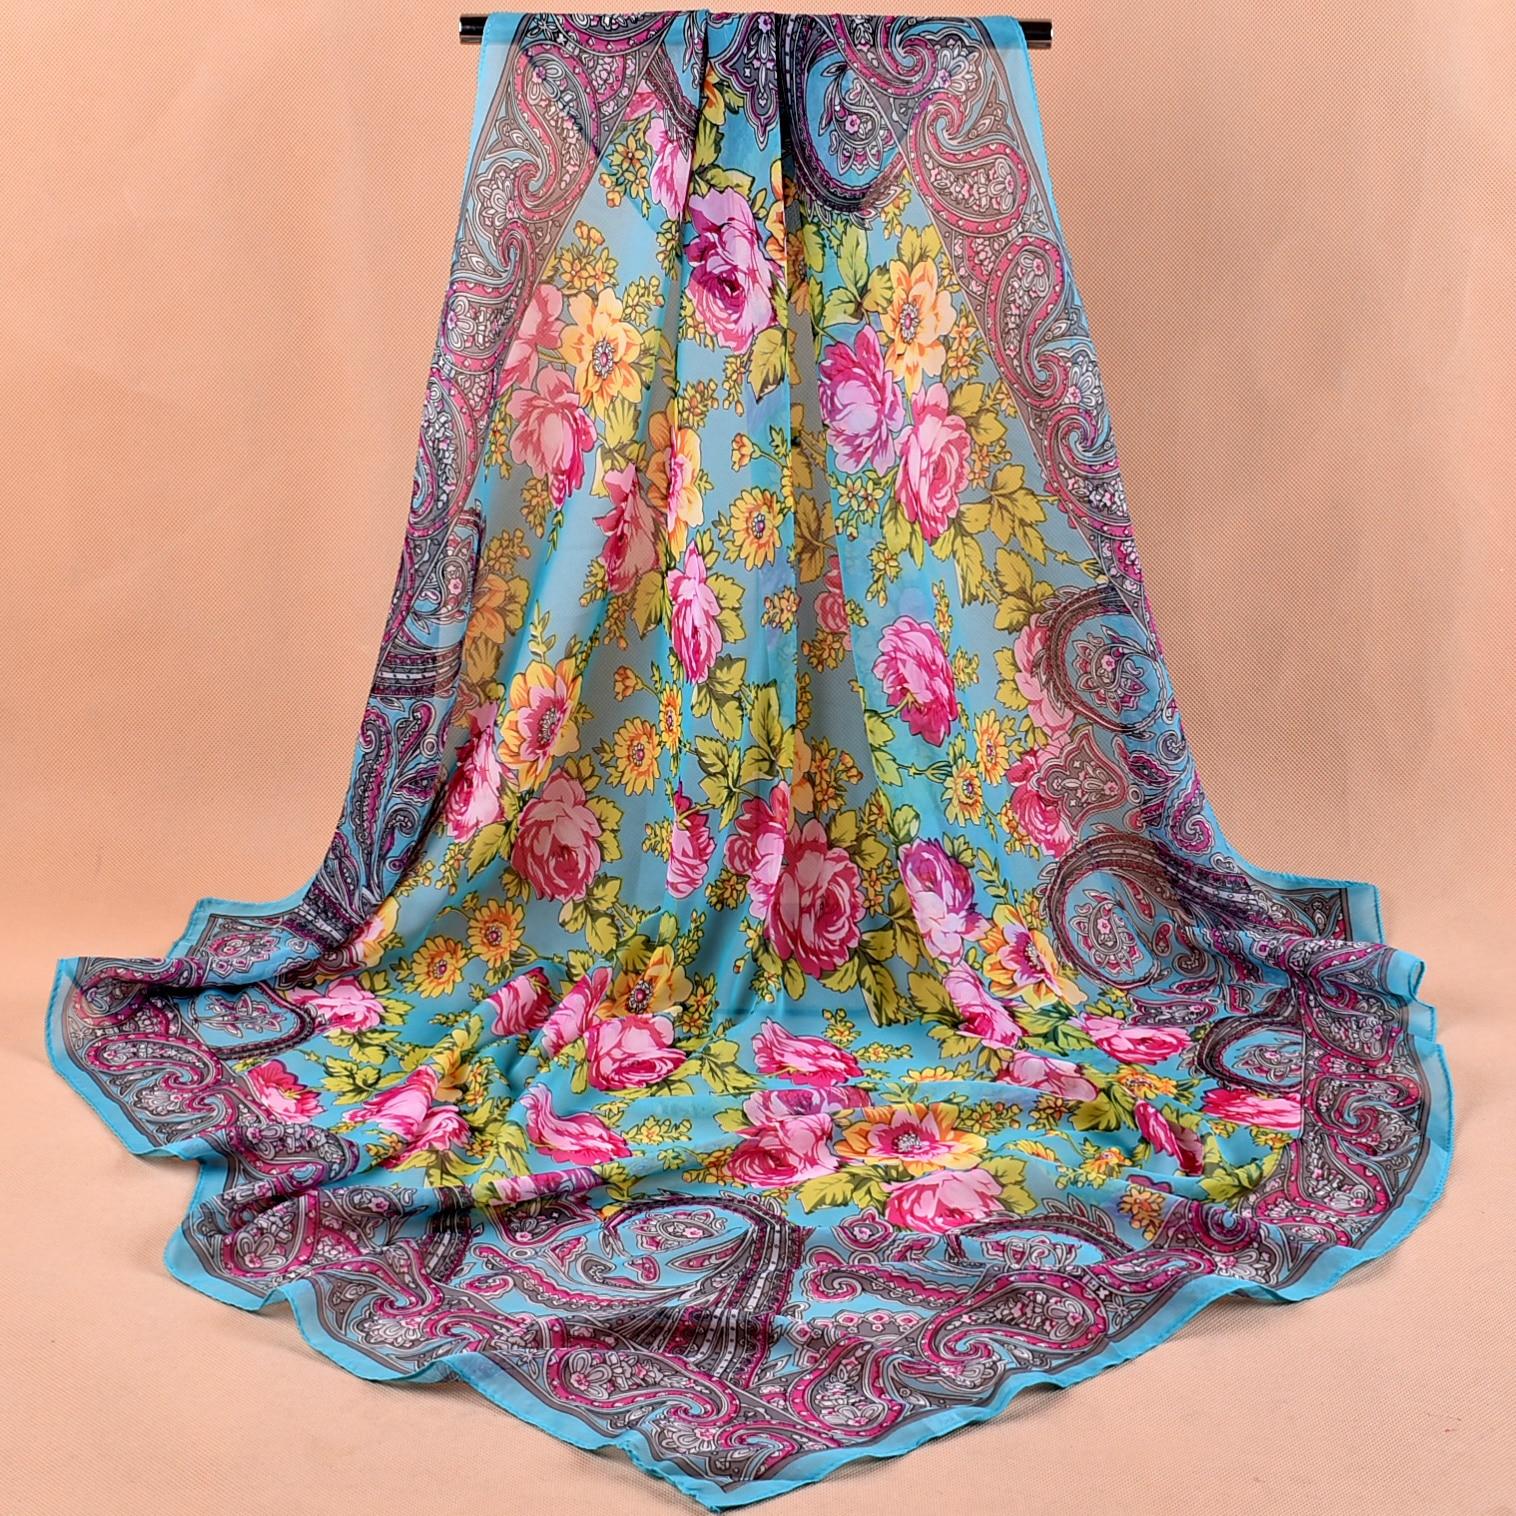 Fashion Shawl Scarves For Women Floral Print Silk Satin Hijab Scarf Female Wraps 90*90cm Square Shawls Bandana Scarfs For Ladies